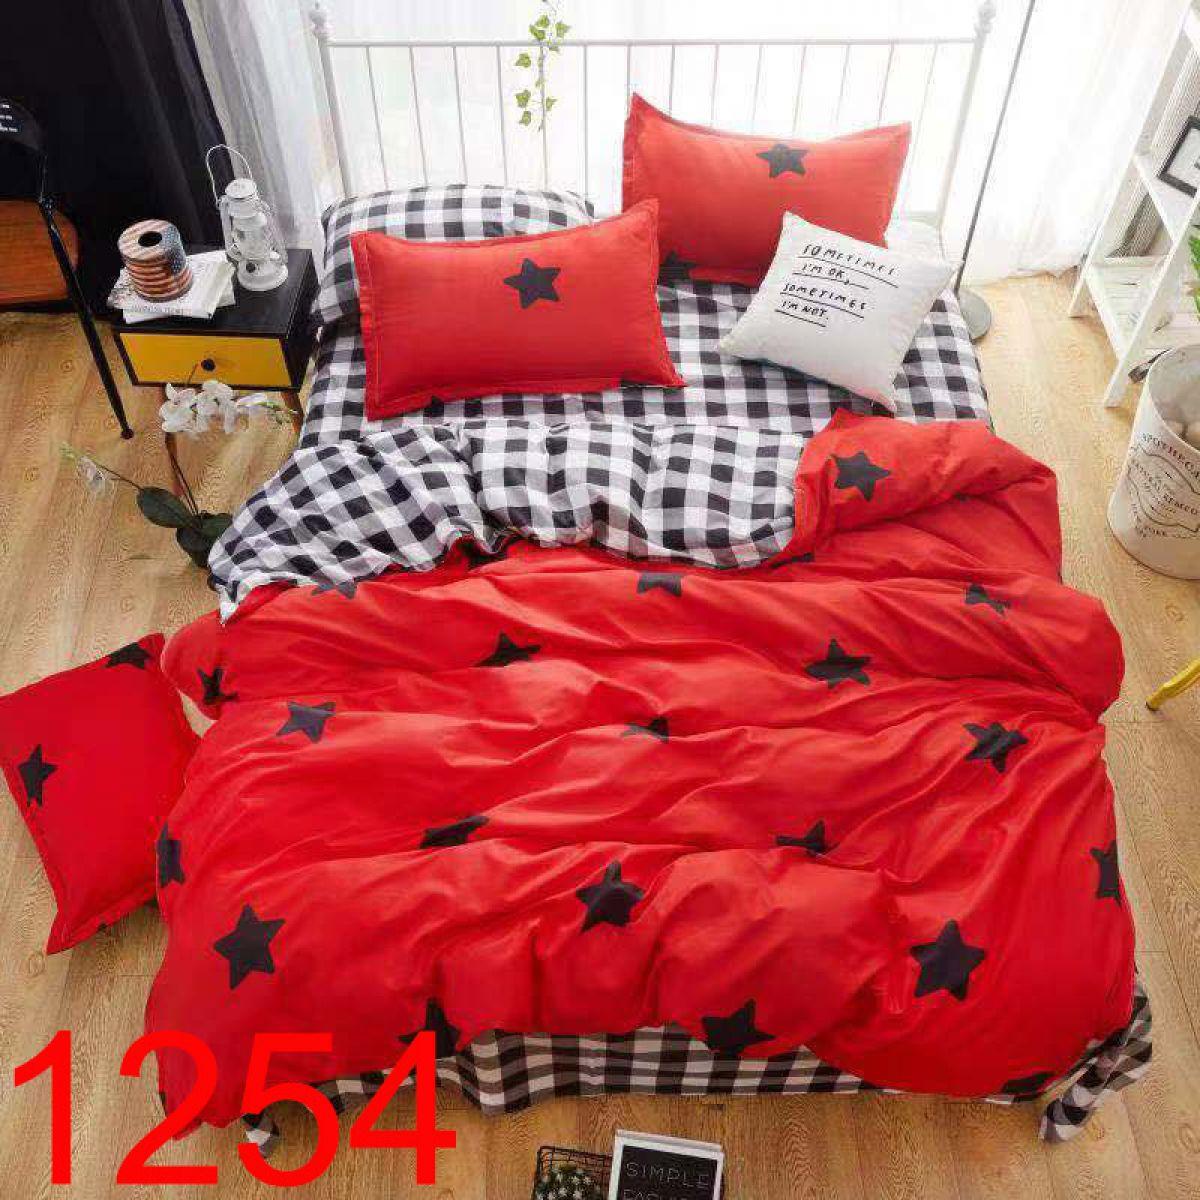 Double-sided Beddings - FBC-8063 - 160x200 cm - 3 pcs